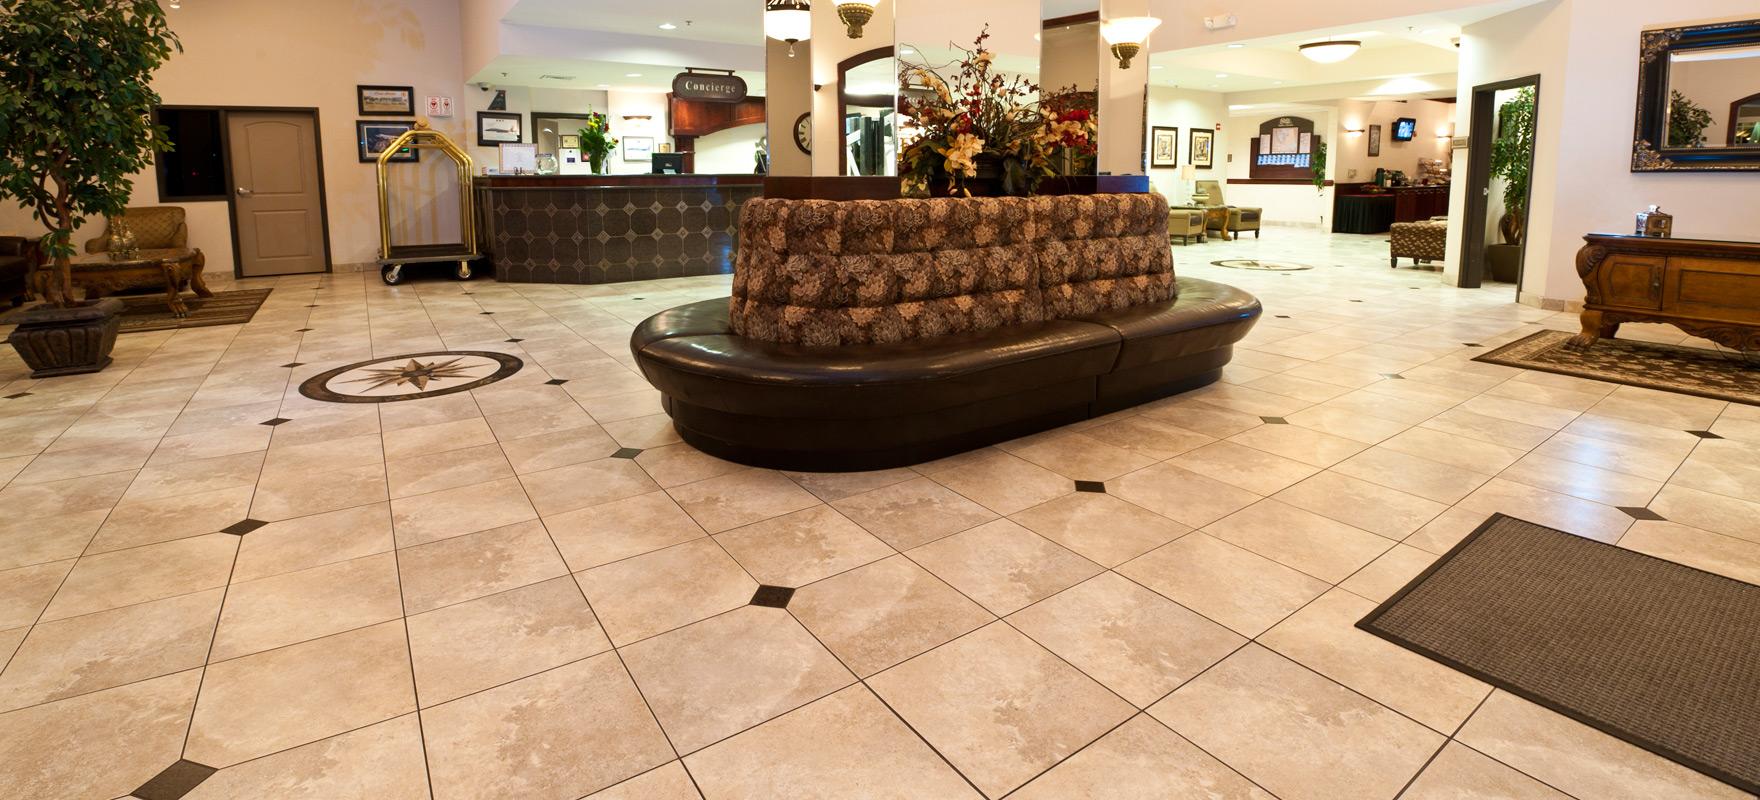 OFFICIAL WEBSITE - Shilo Inns Suites Hotels - bwin werbung bwin Live-Fußballergebnisse Warrenton | Oregon